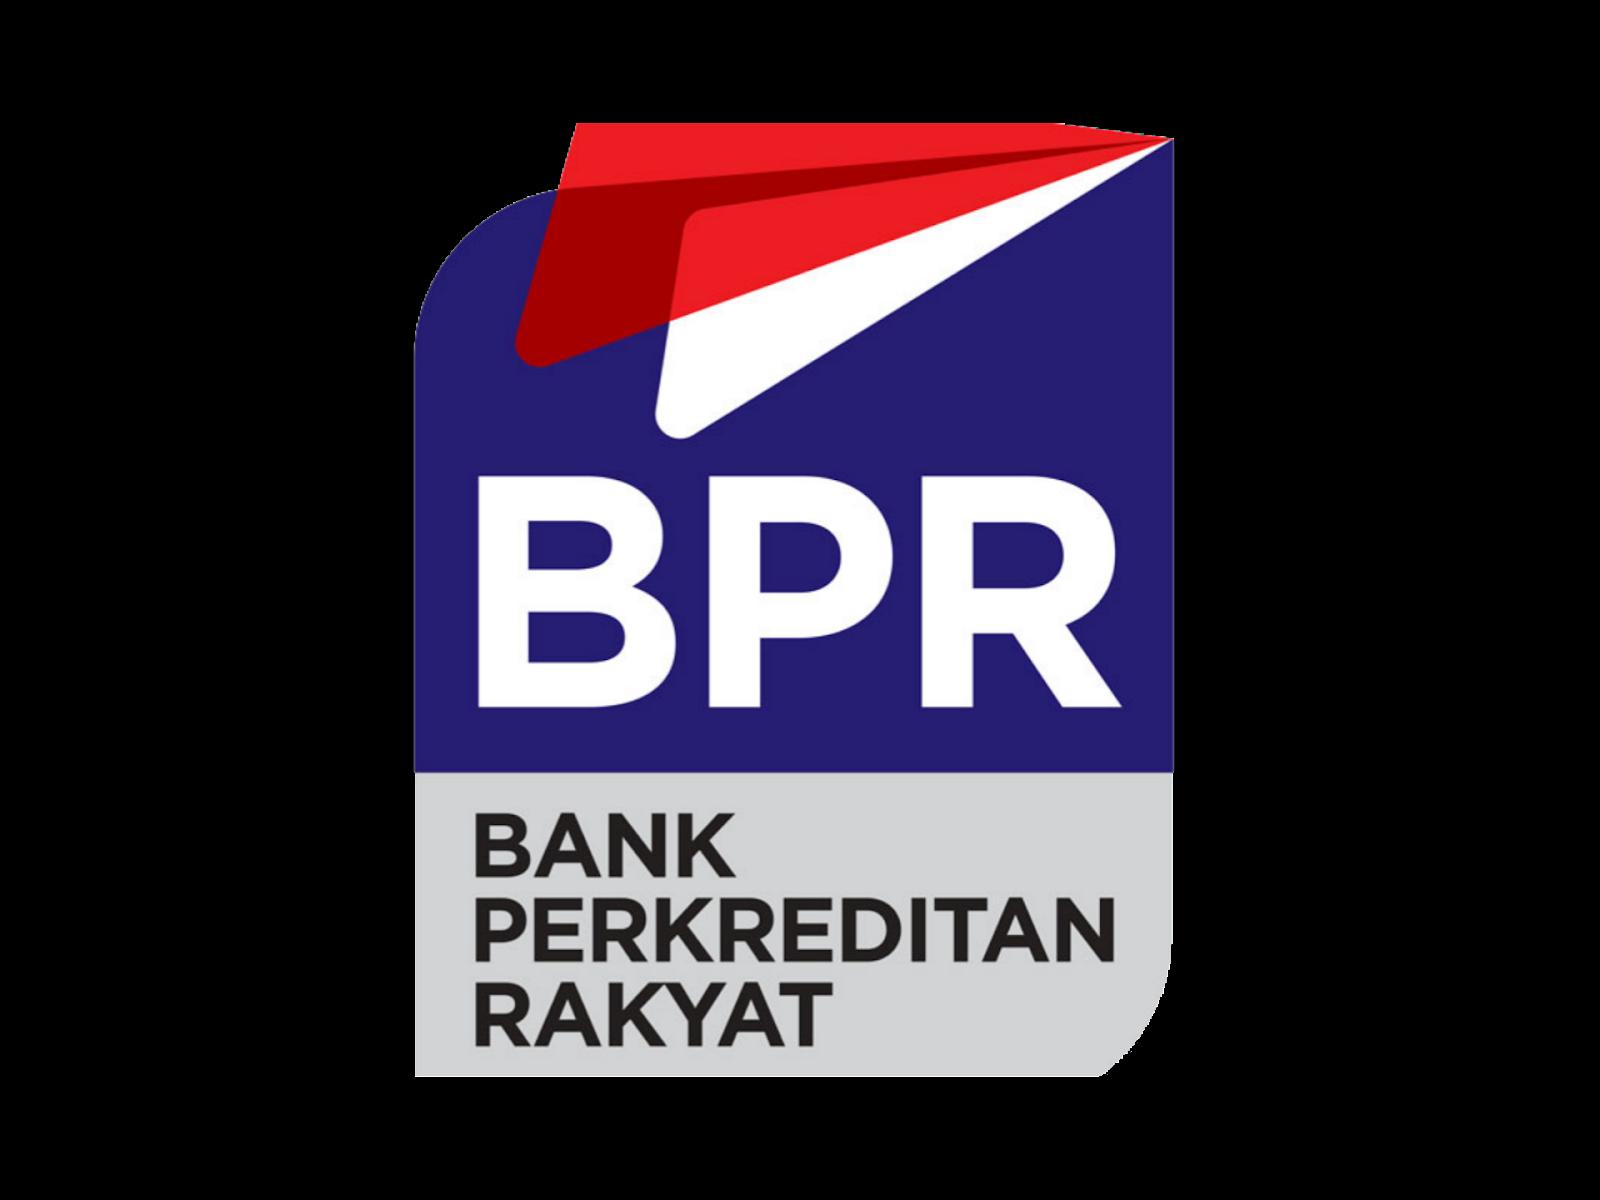 Logo Bank Perkreditan Rakyat Format PNG